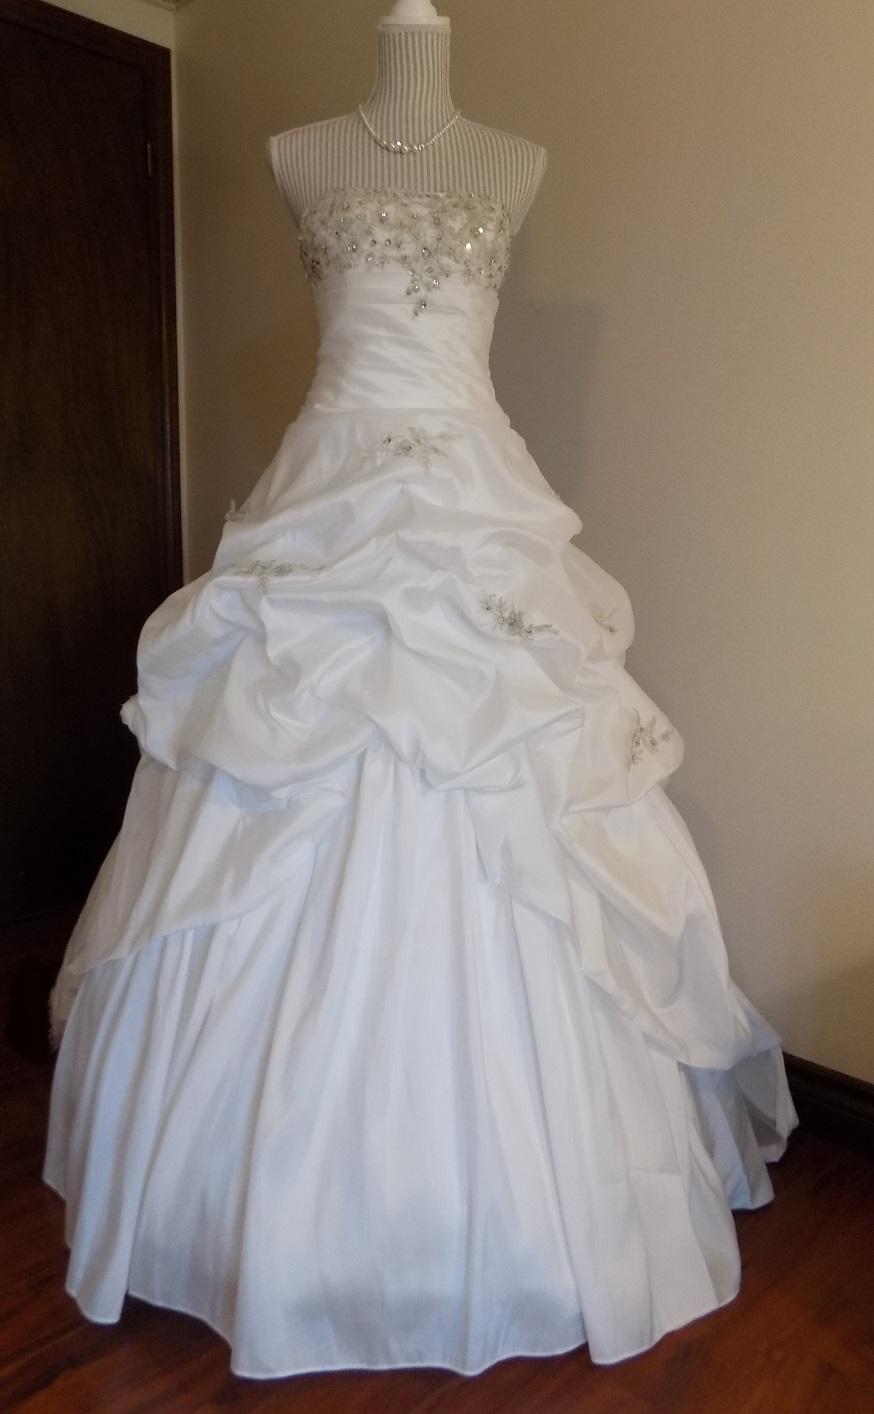 Wedding dress rental london ontario flower girl dresses for Rent wedding dress london